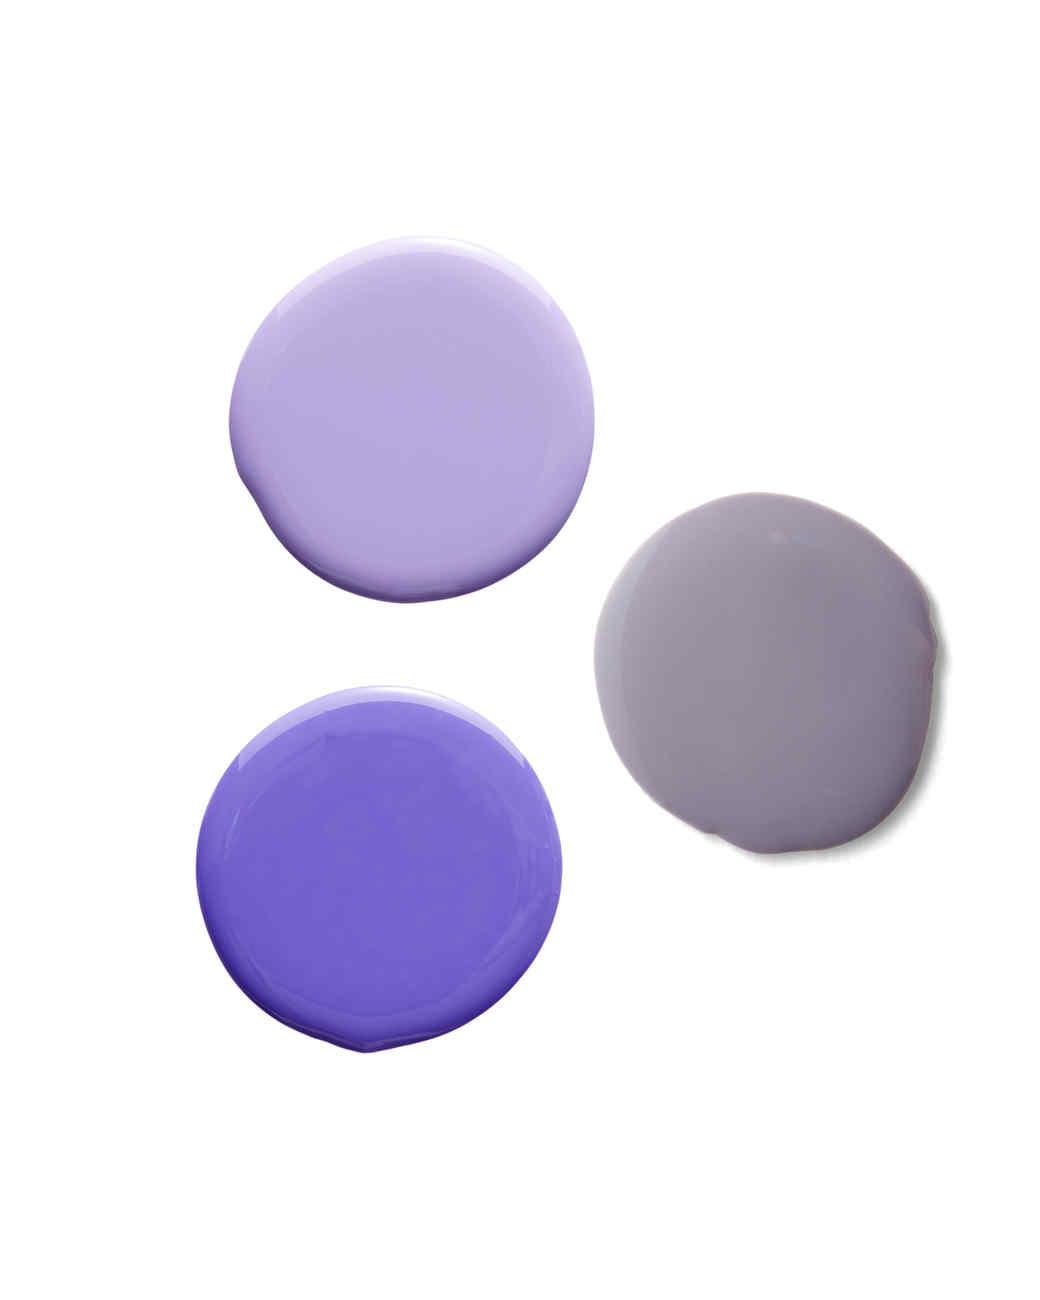 nail-polish-midpurples-msl0612.jpg